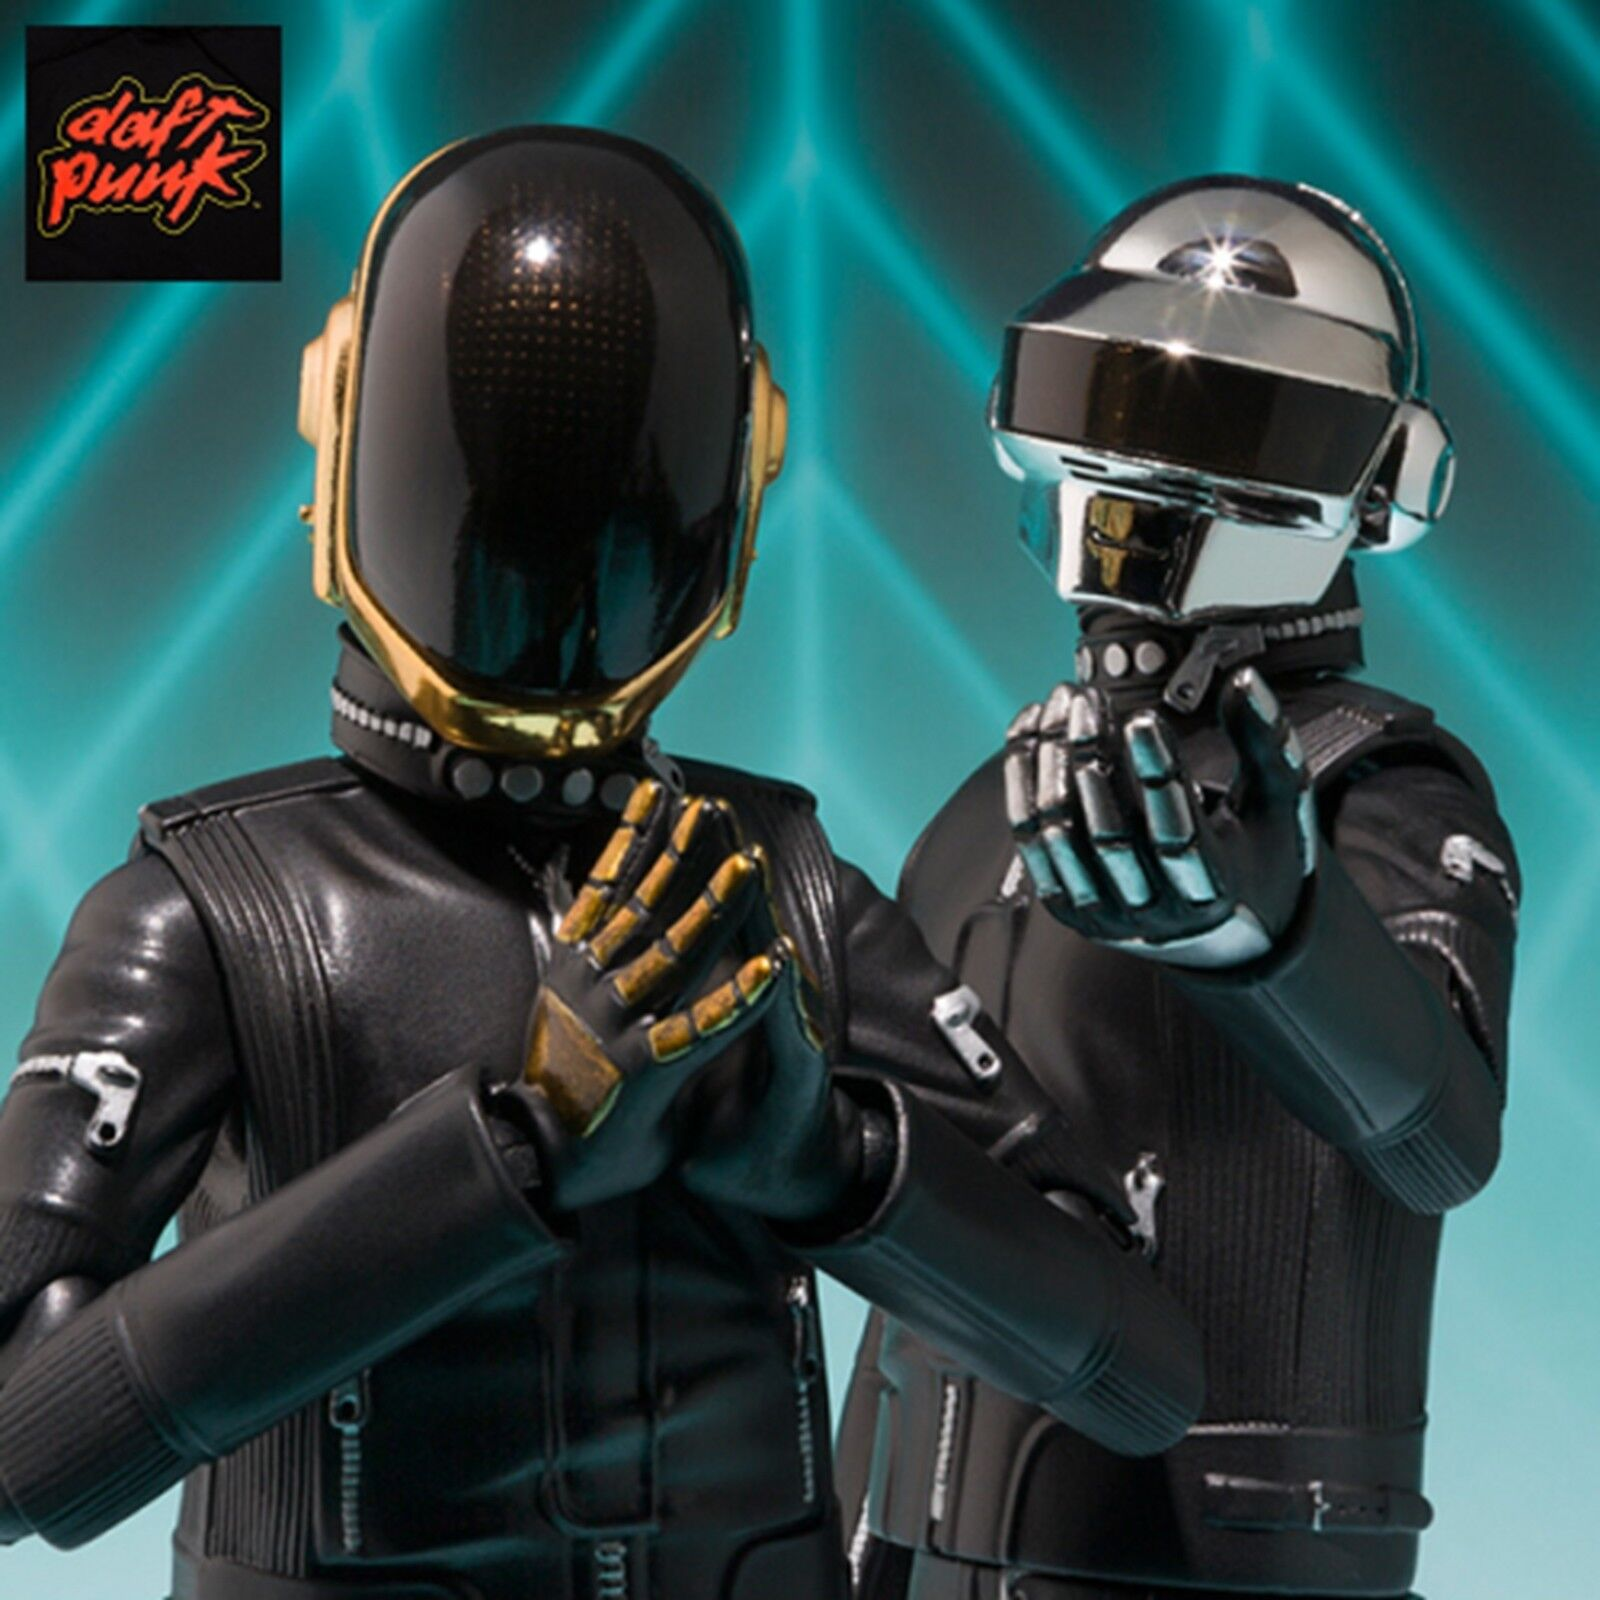 S.H.Figuarts Daft Punk Thomas Bangalter Guy-Manuel Figure Set of 2 Bandai New